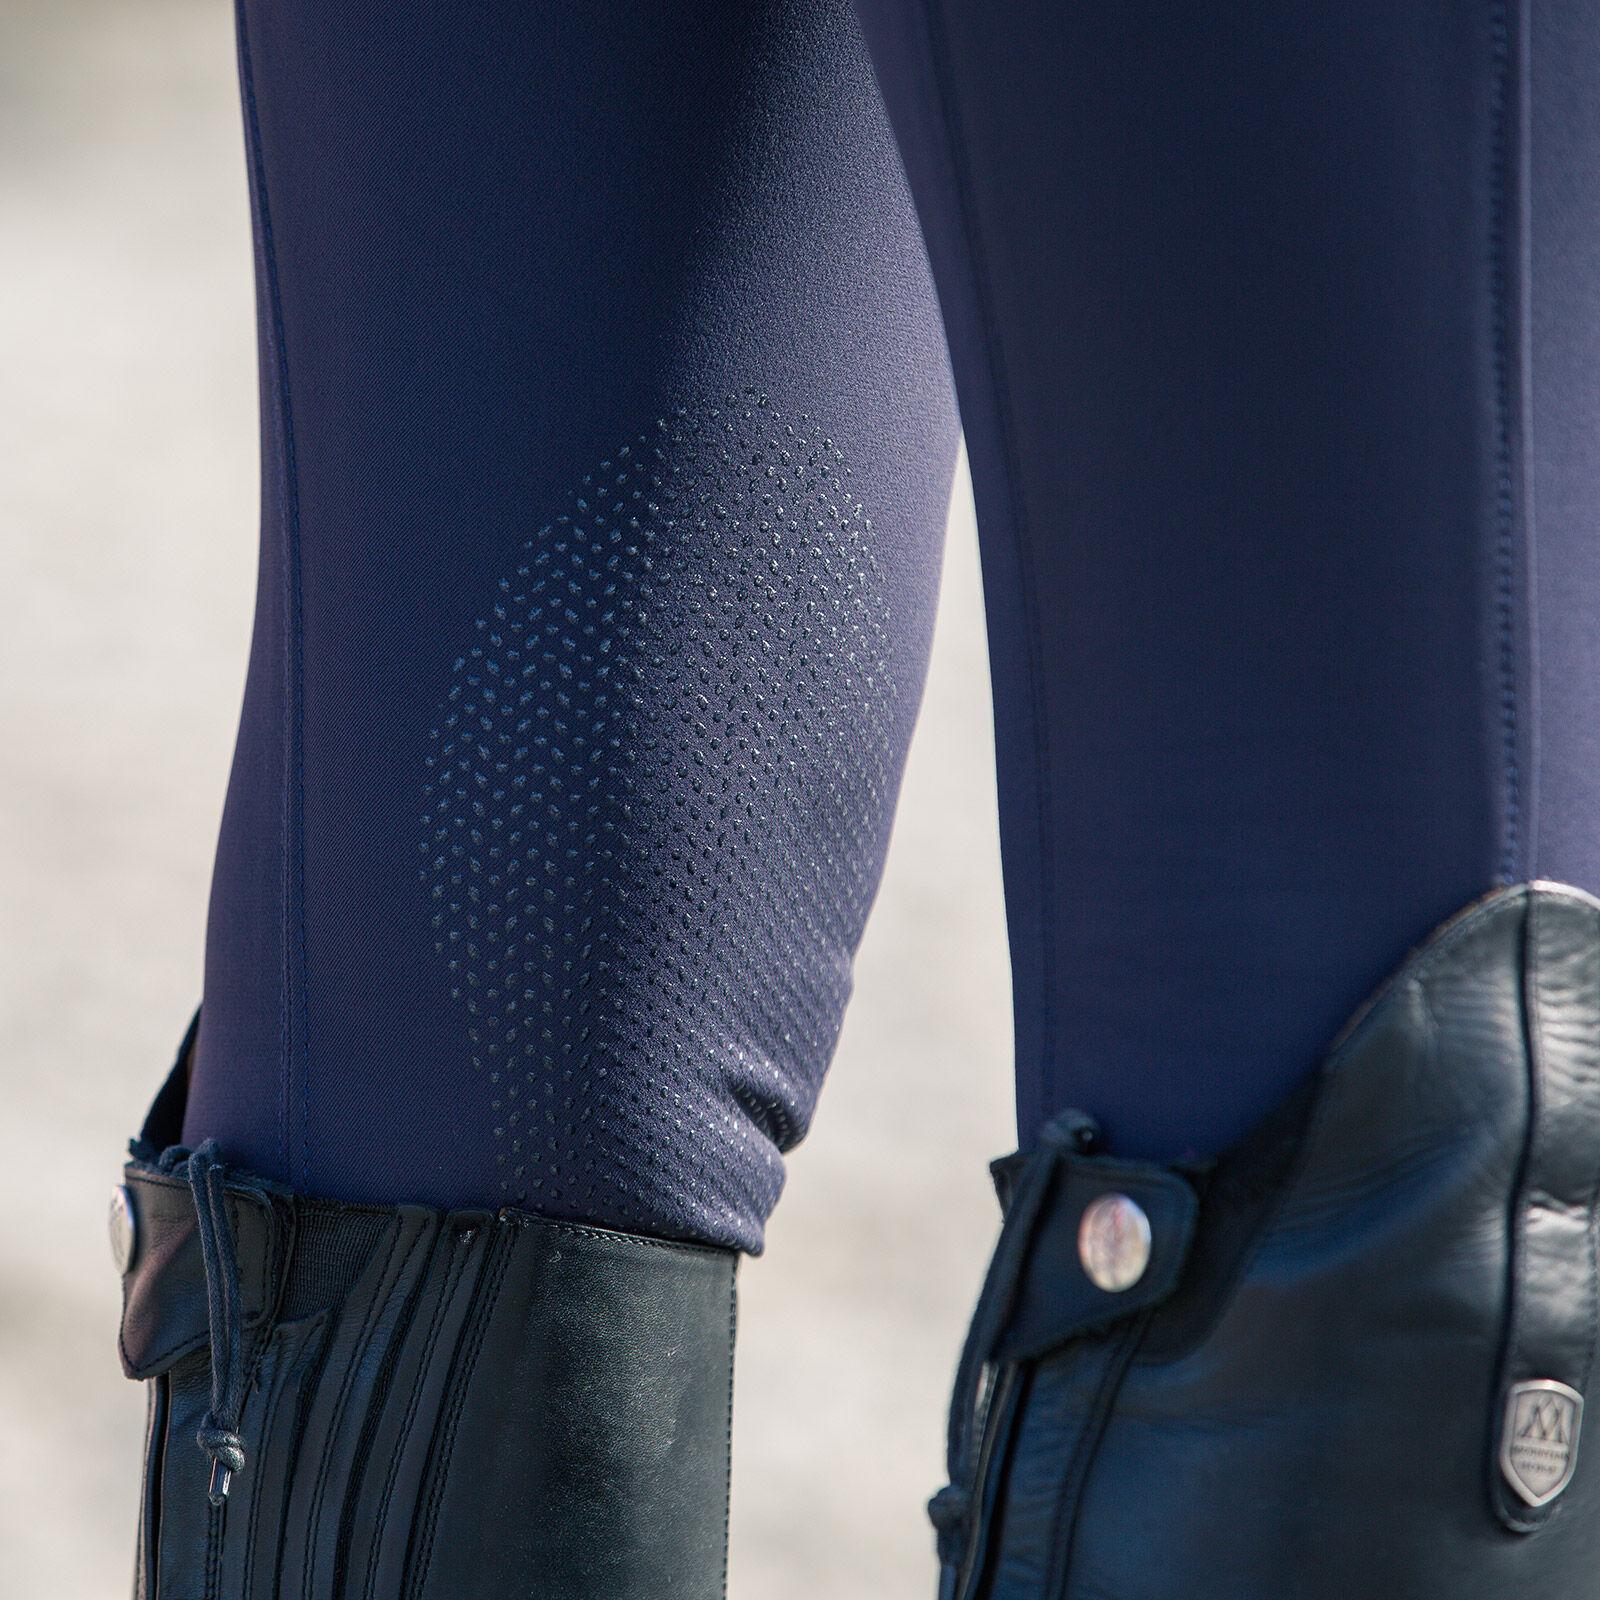 Riding Clothing BVertigo Olivia Women/'s Silicone Knee Patch Breeches